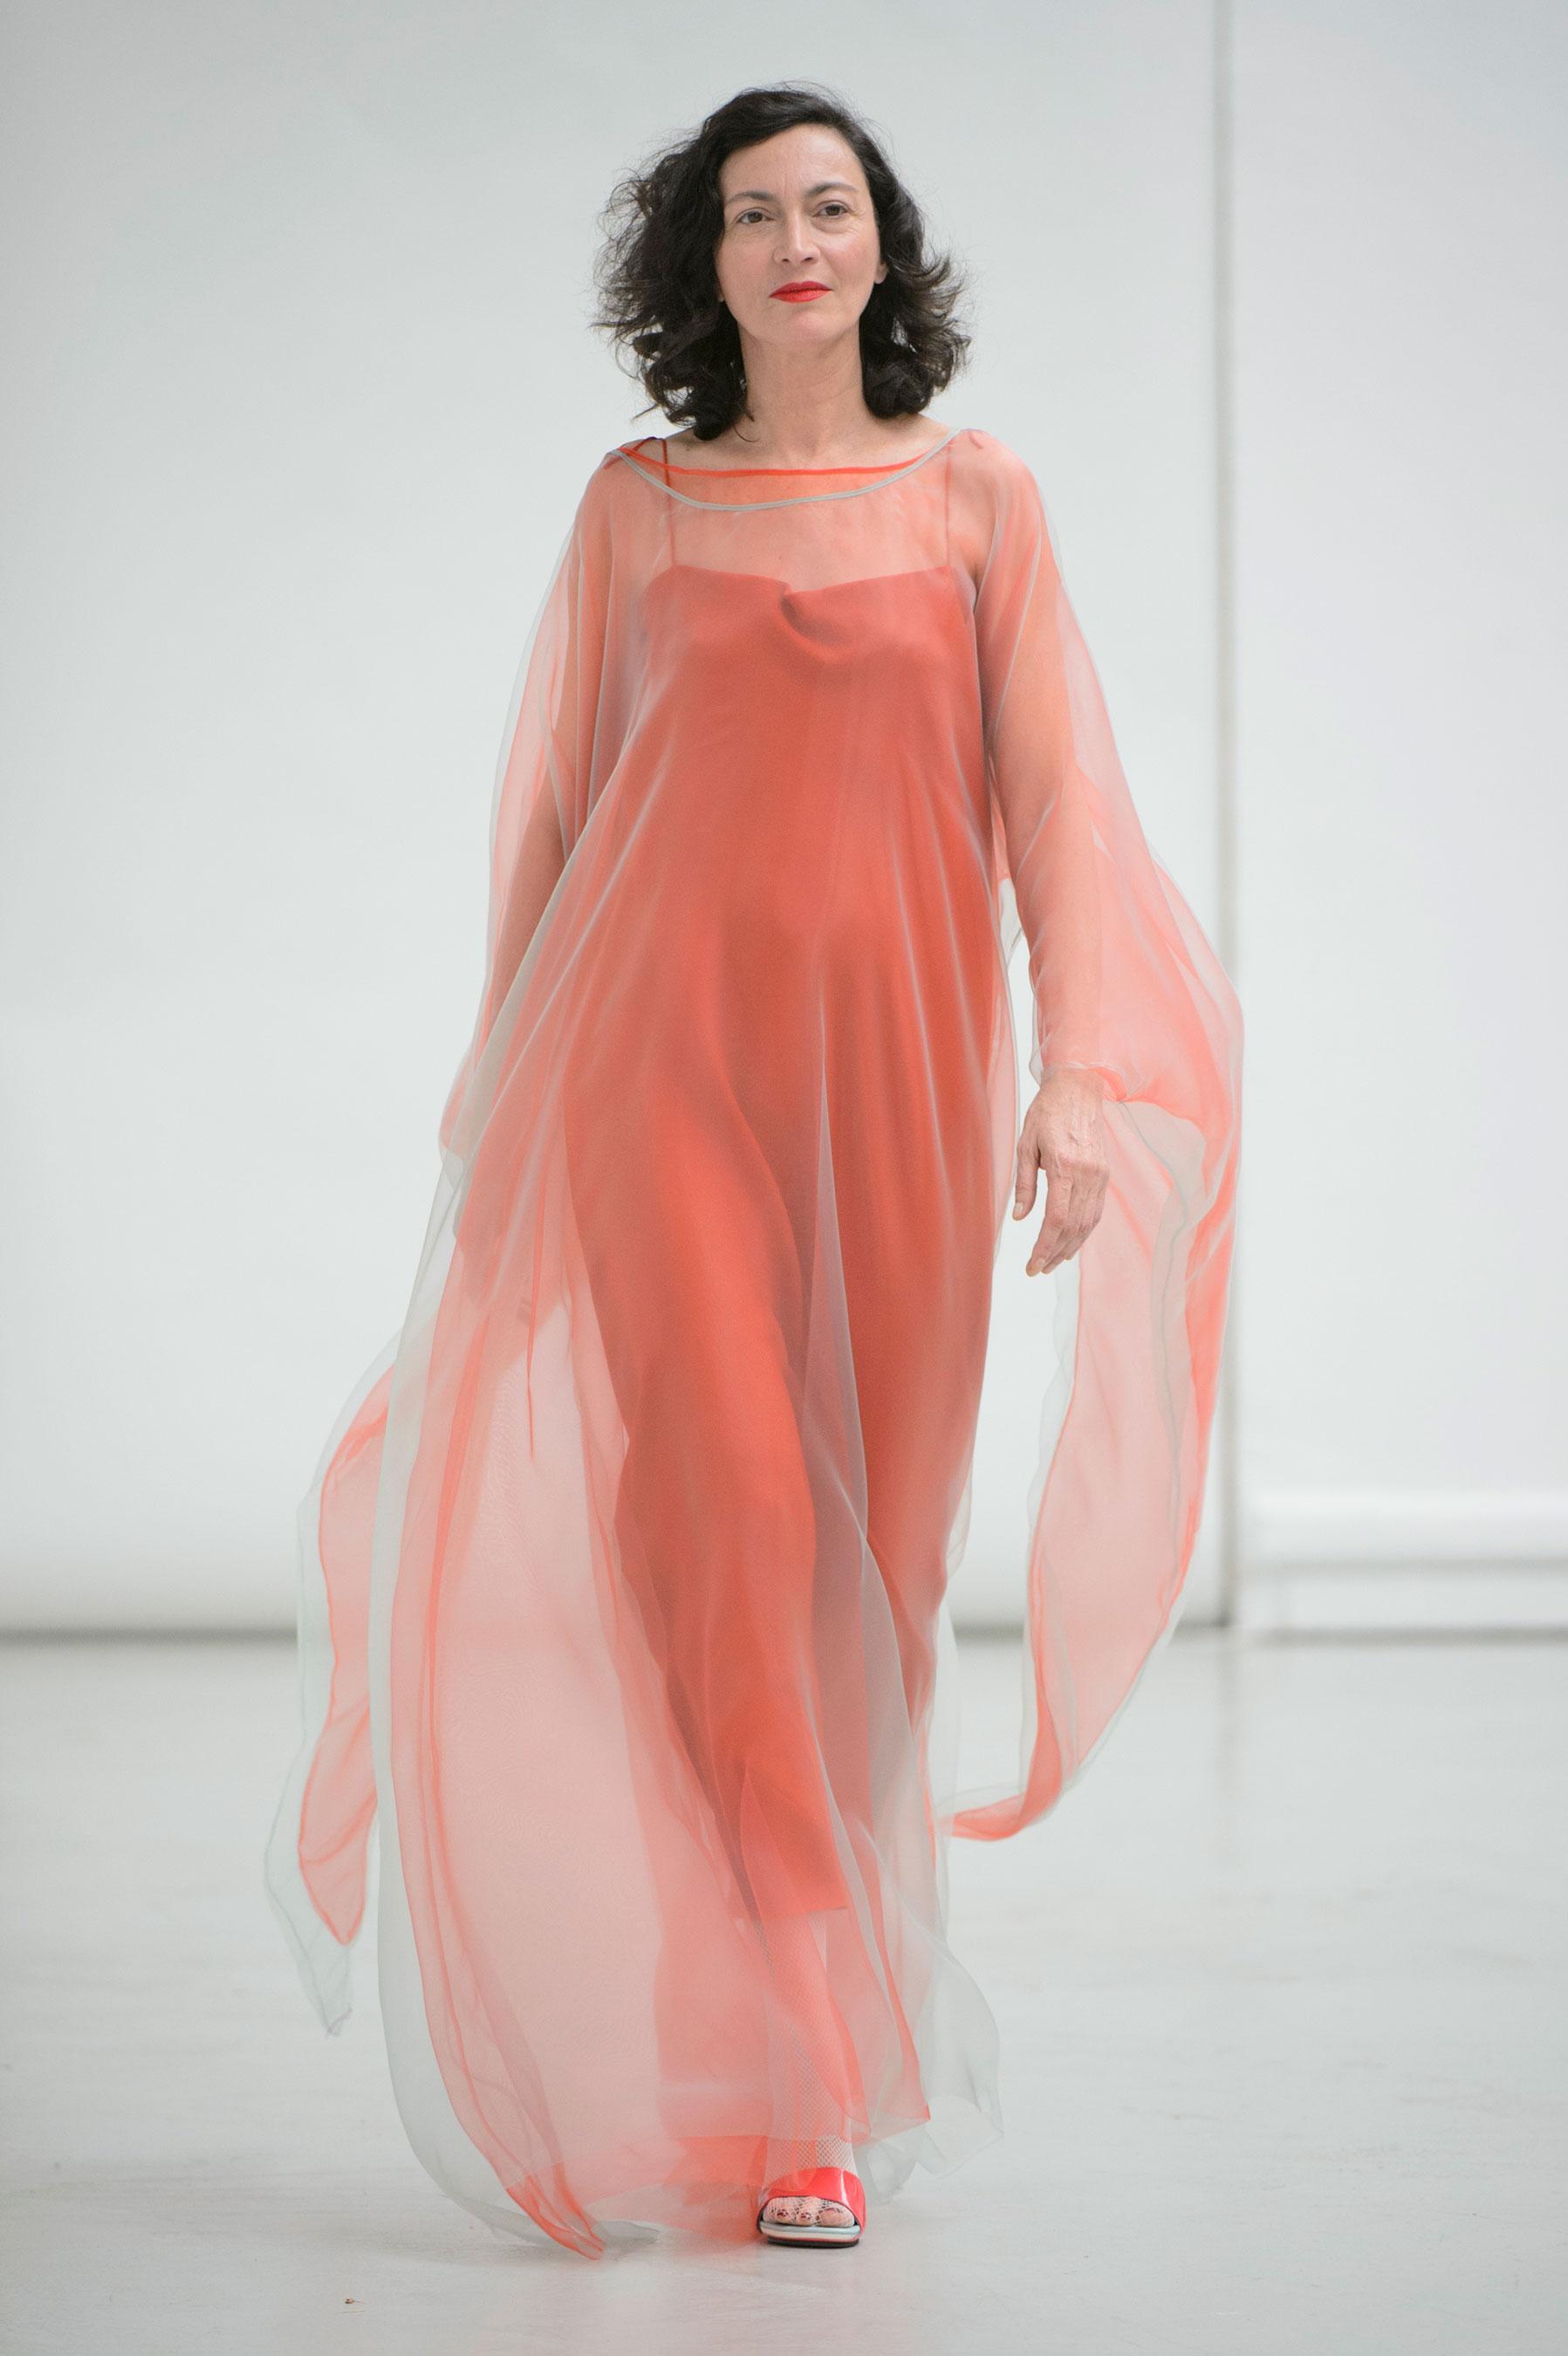 bbb7eda44569d1 Défilé Adeline André Automne-hiver 2016-2017 Couture - Madame Figaro